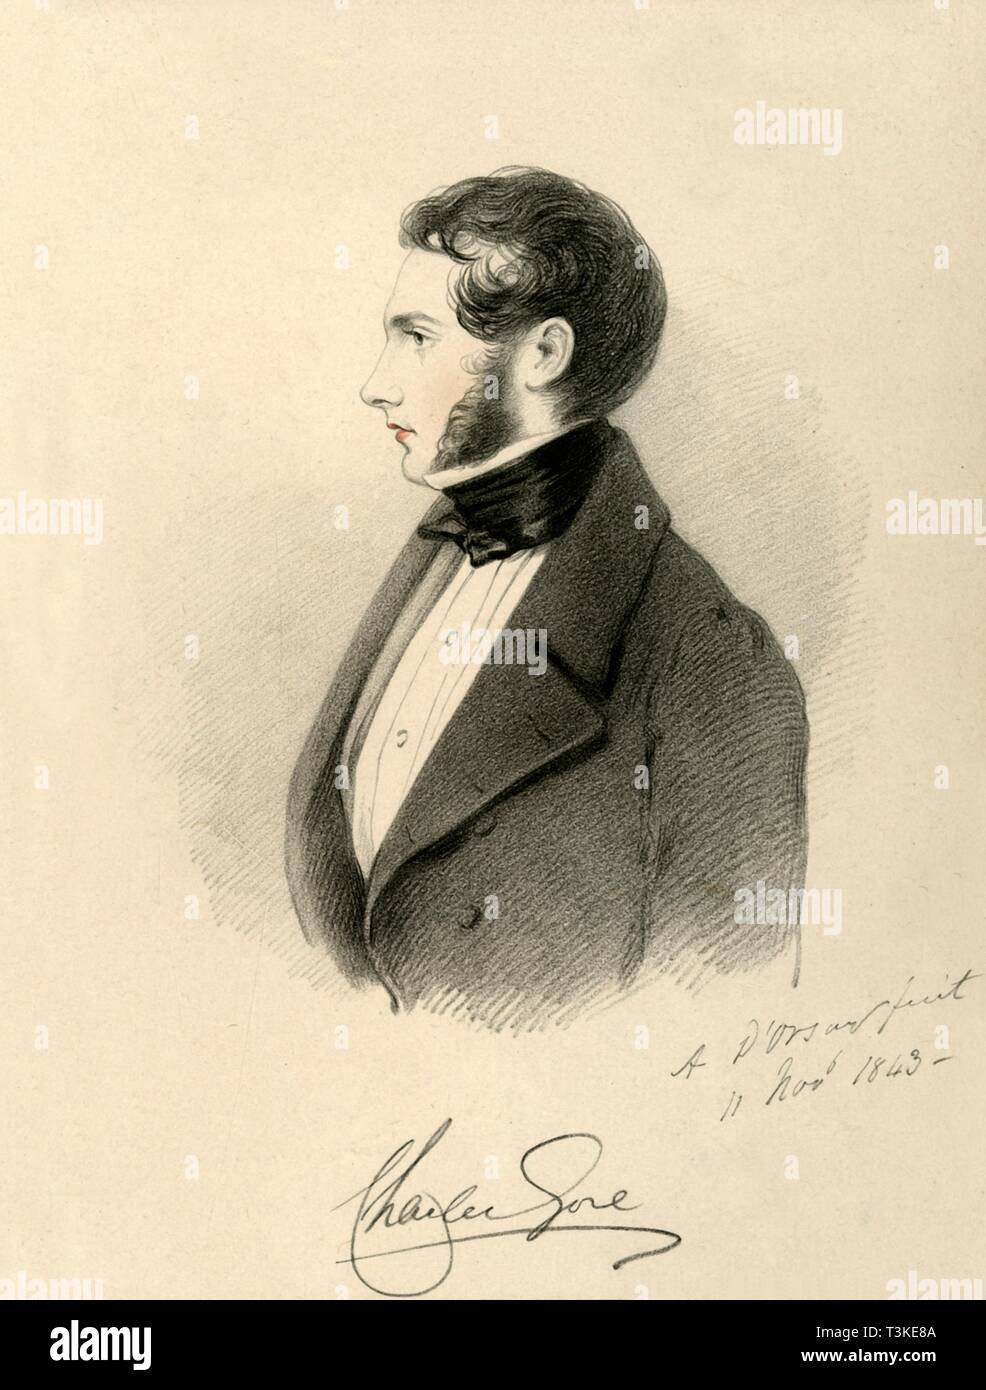 'The Hon. Charles Gore', 1843. Creator: Richard James Lane. - Stock Image